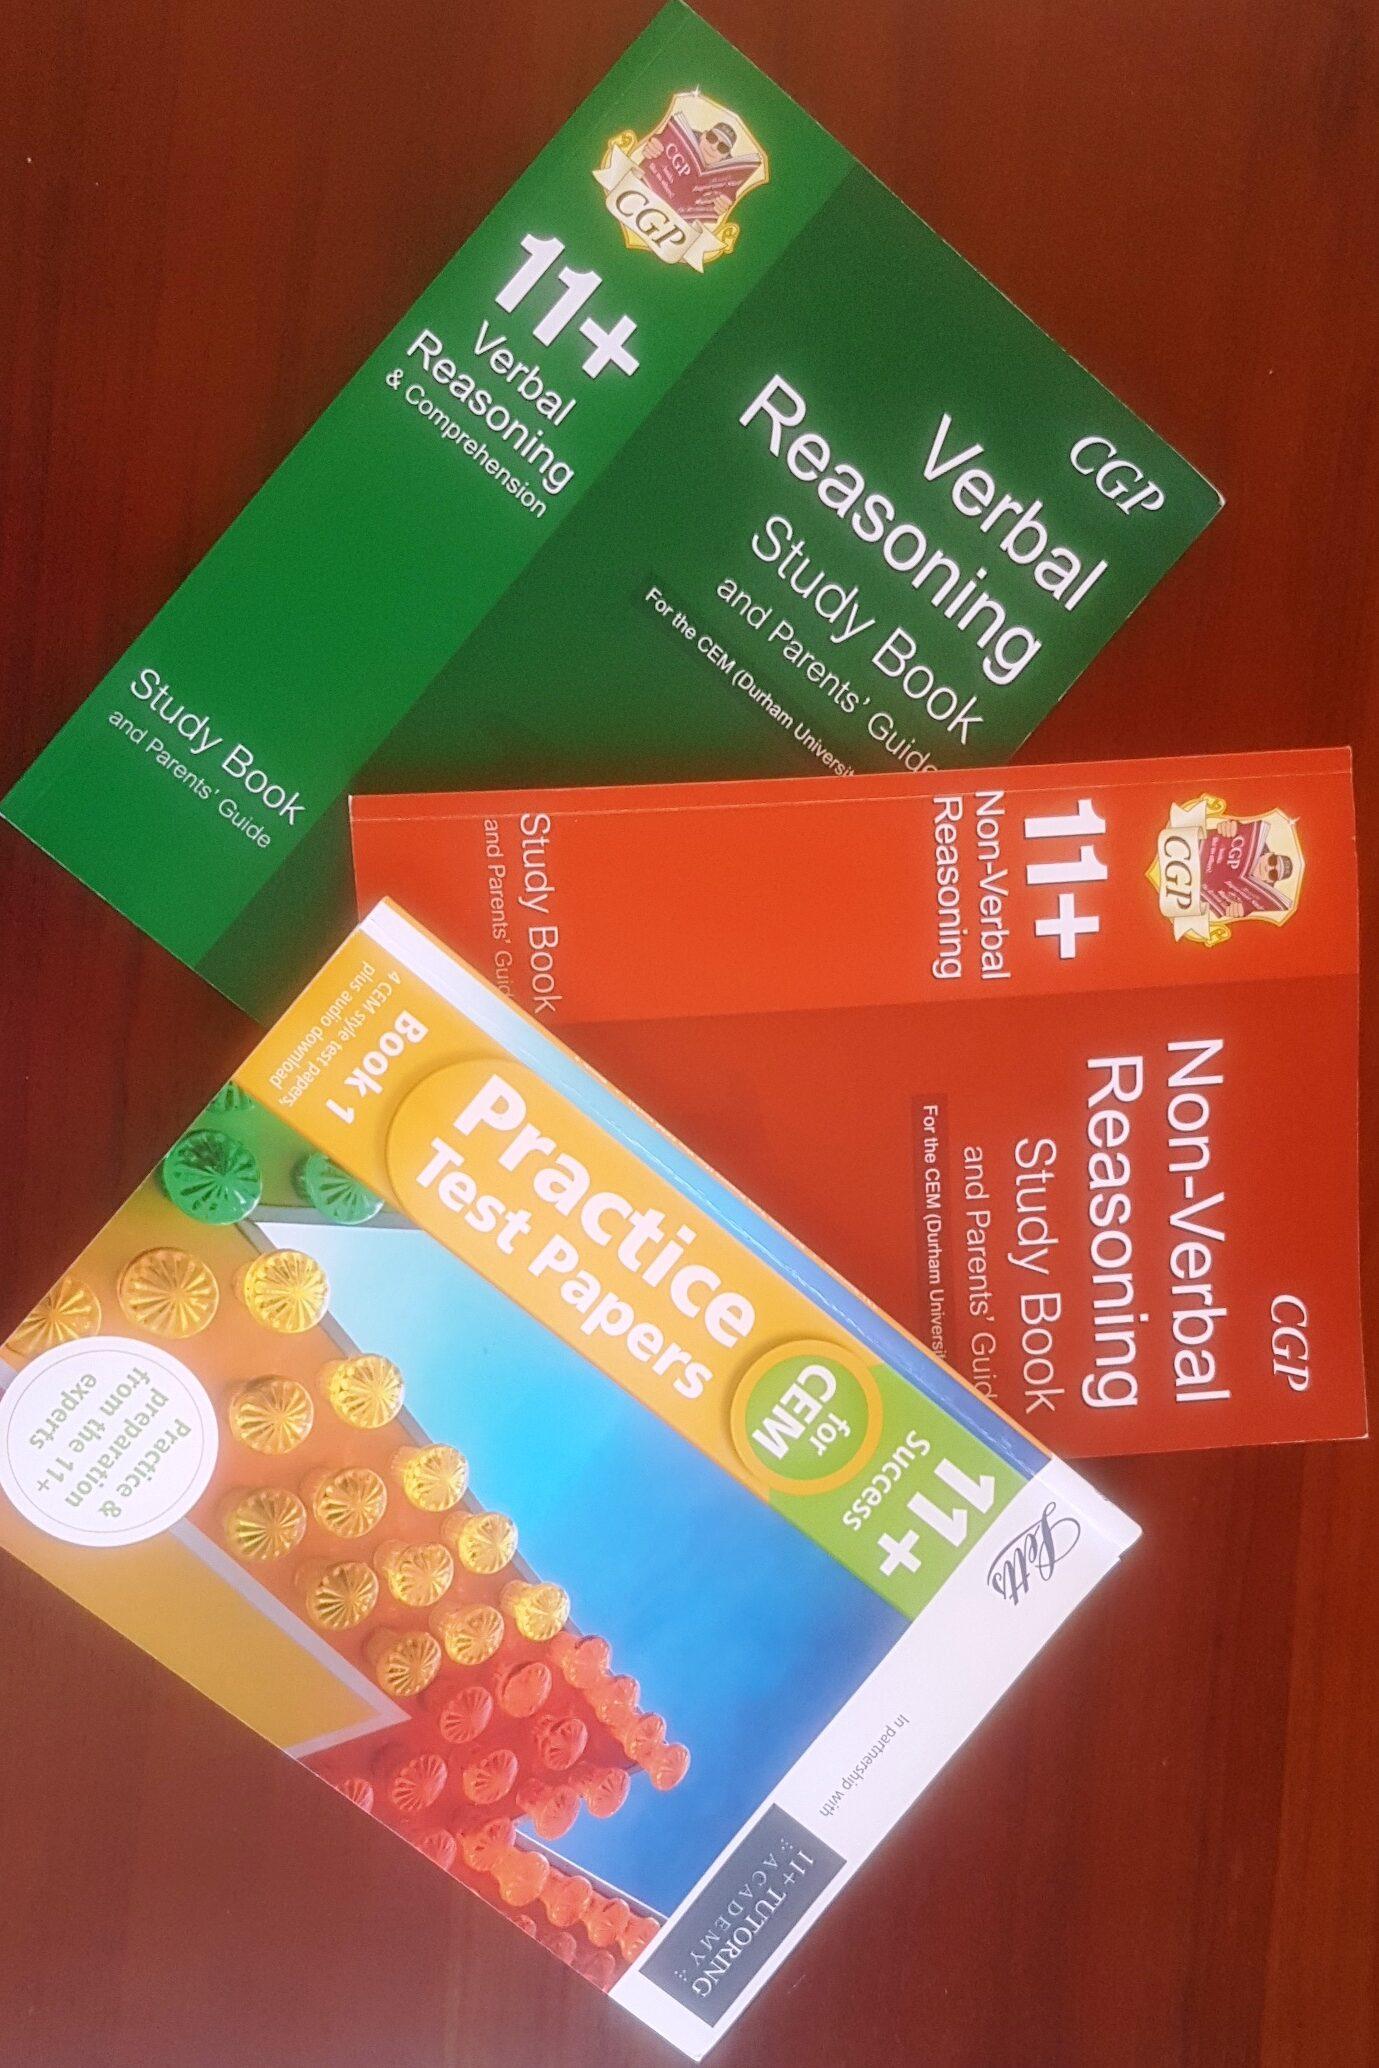 revision books, 11+ exam preparation, grammar school entrance exam, preparing for the 11+, preparing for the grammar school entrance exam, late entrance exam, grammar late entrance test